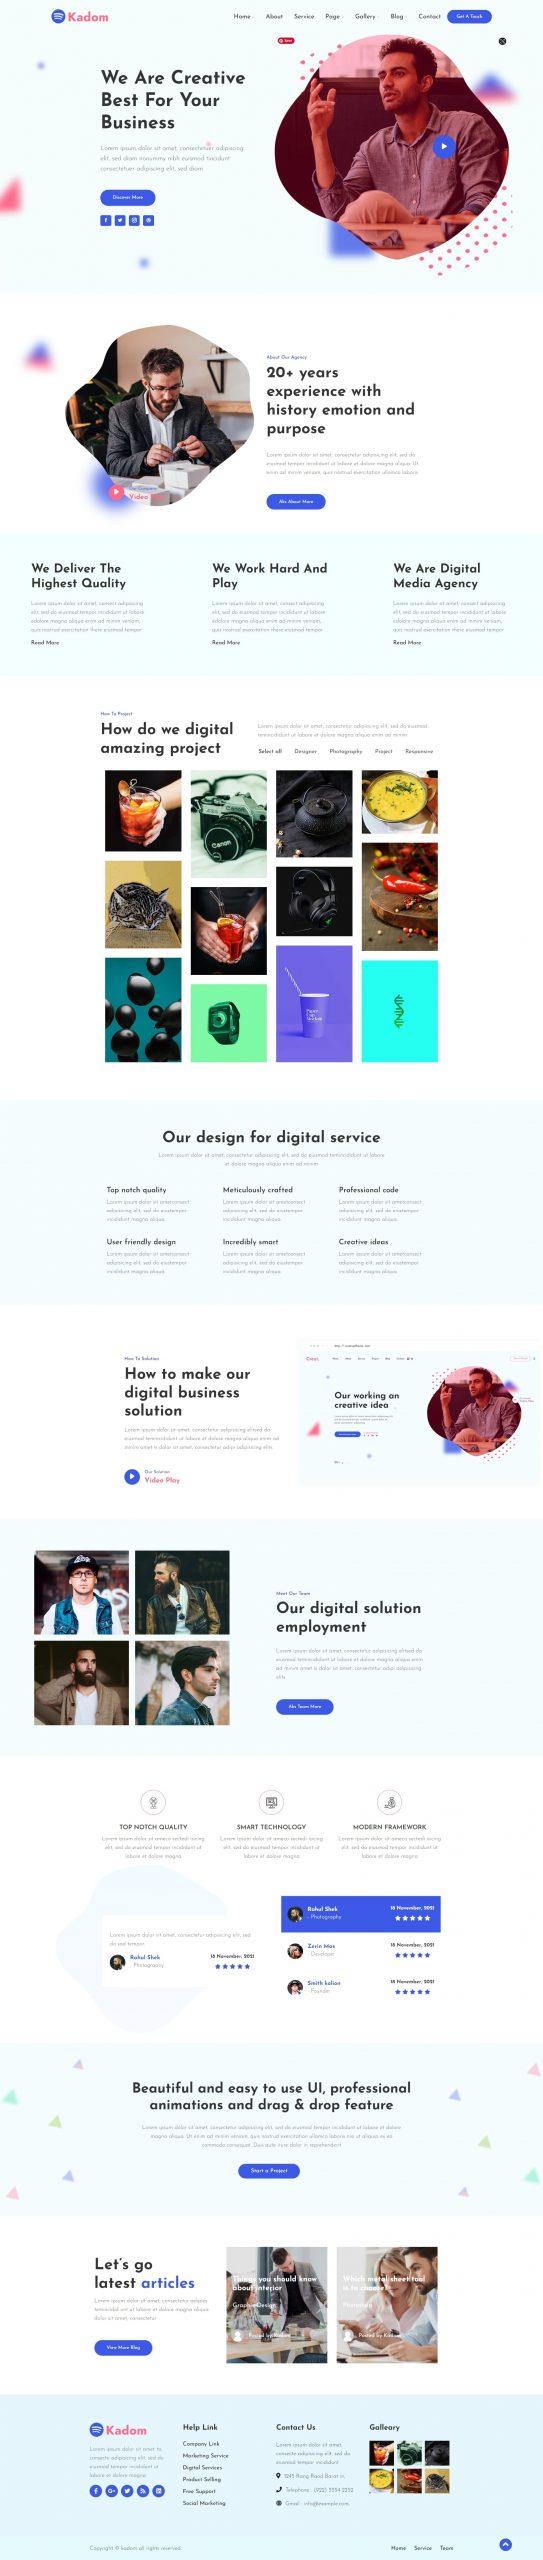 Kadom - Creative Responsive WordPress Theme